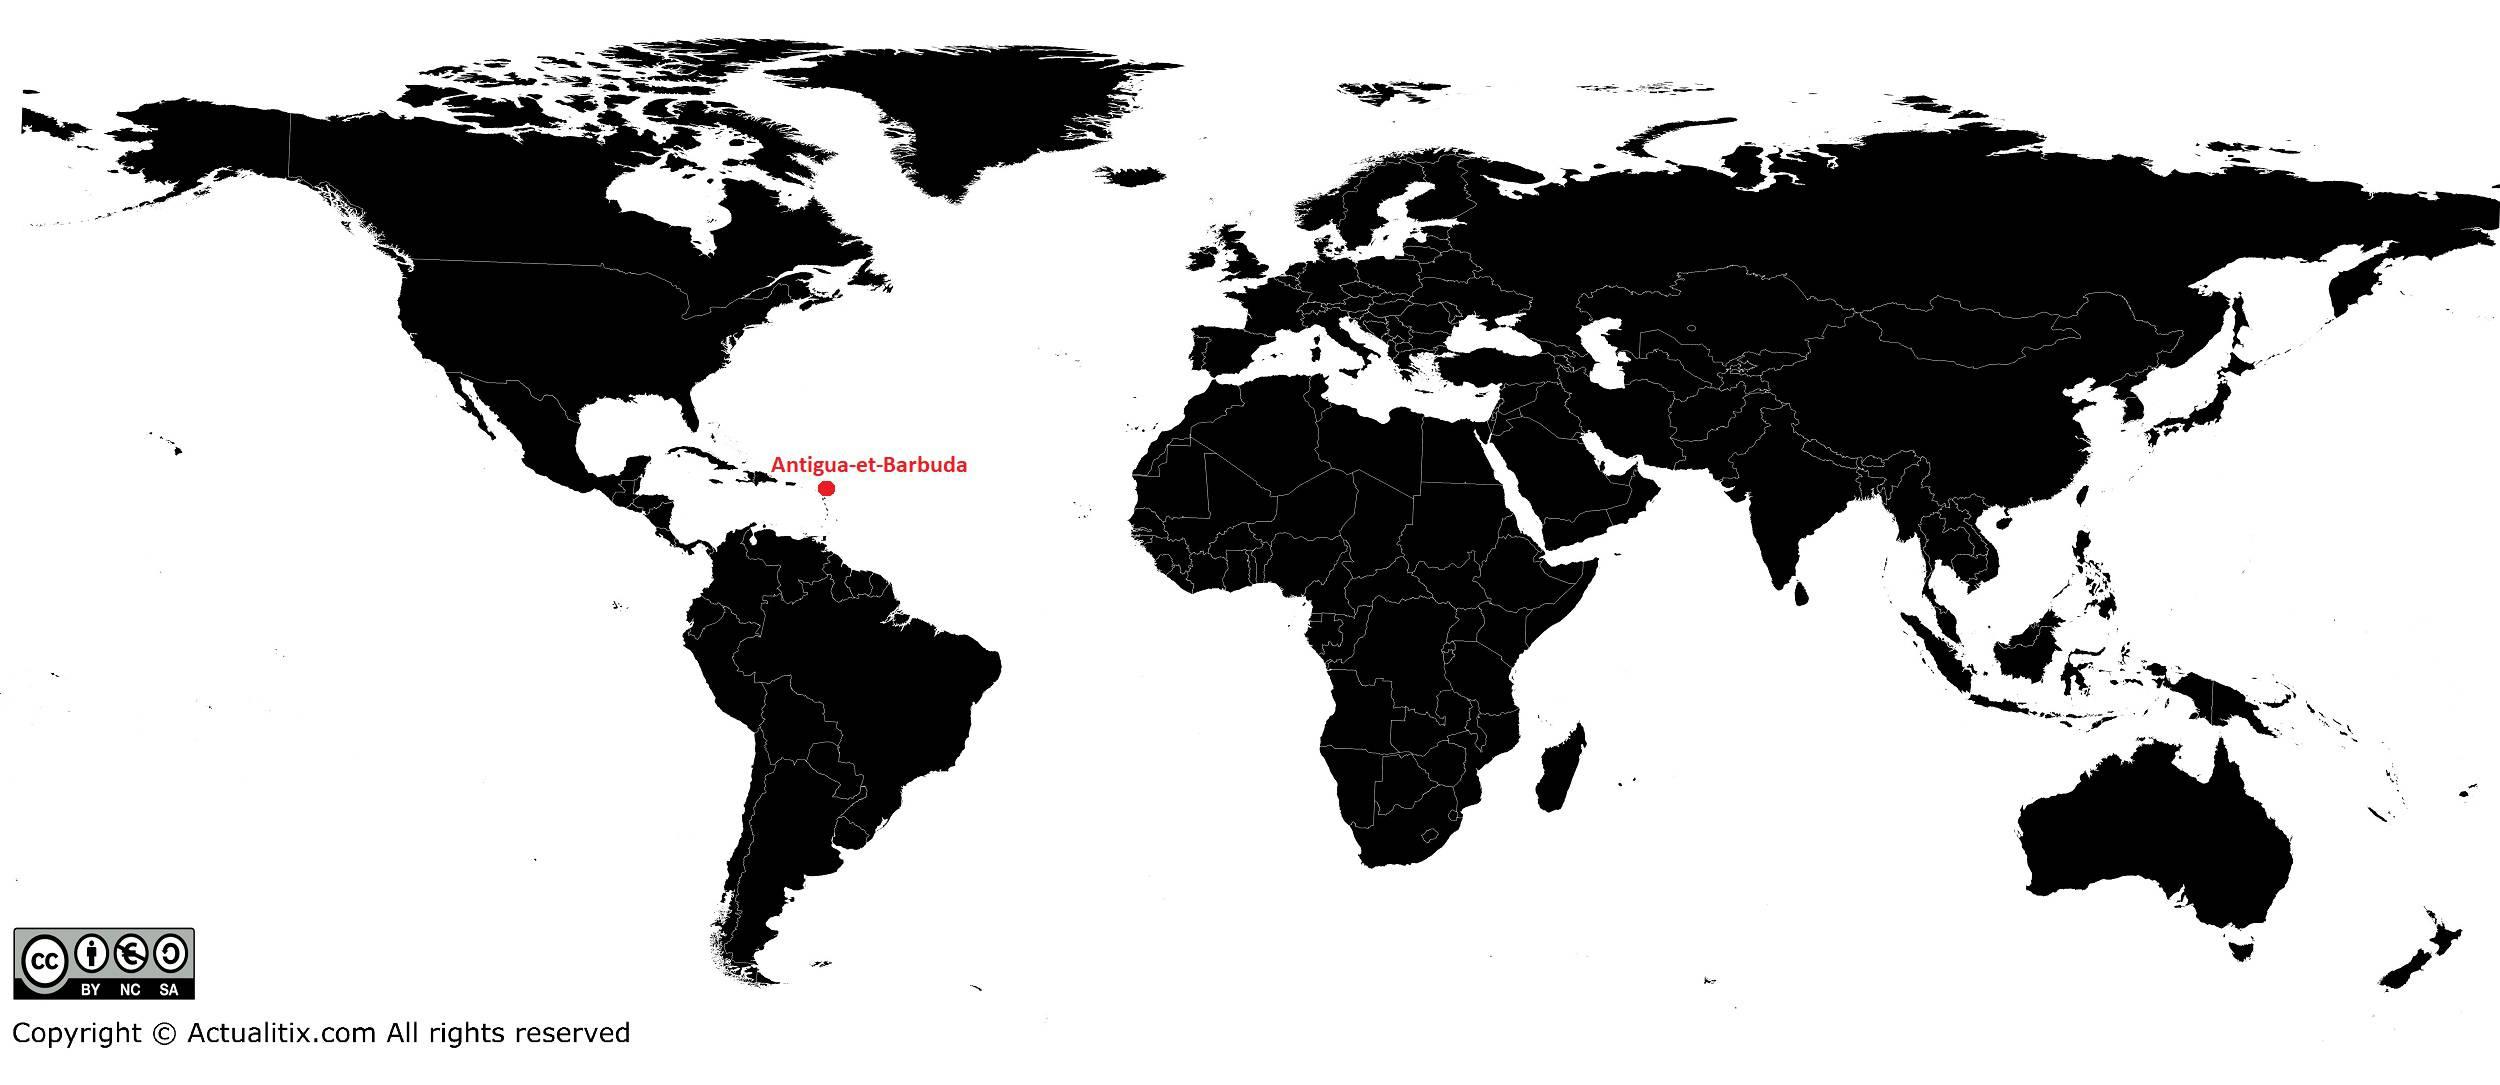 Antigua-et-Barbuda sur une carte du monde